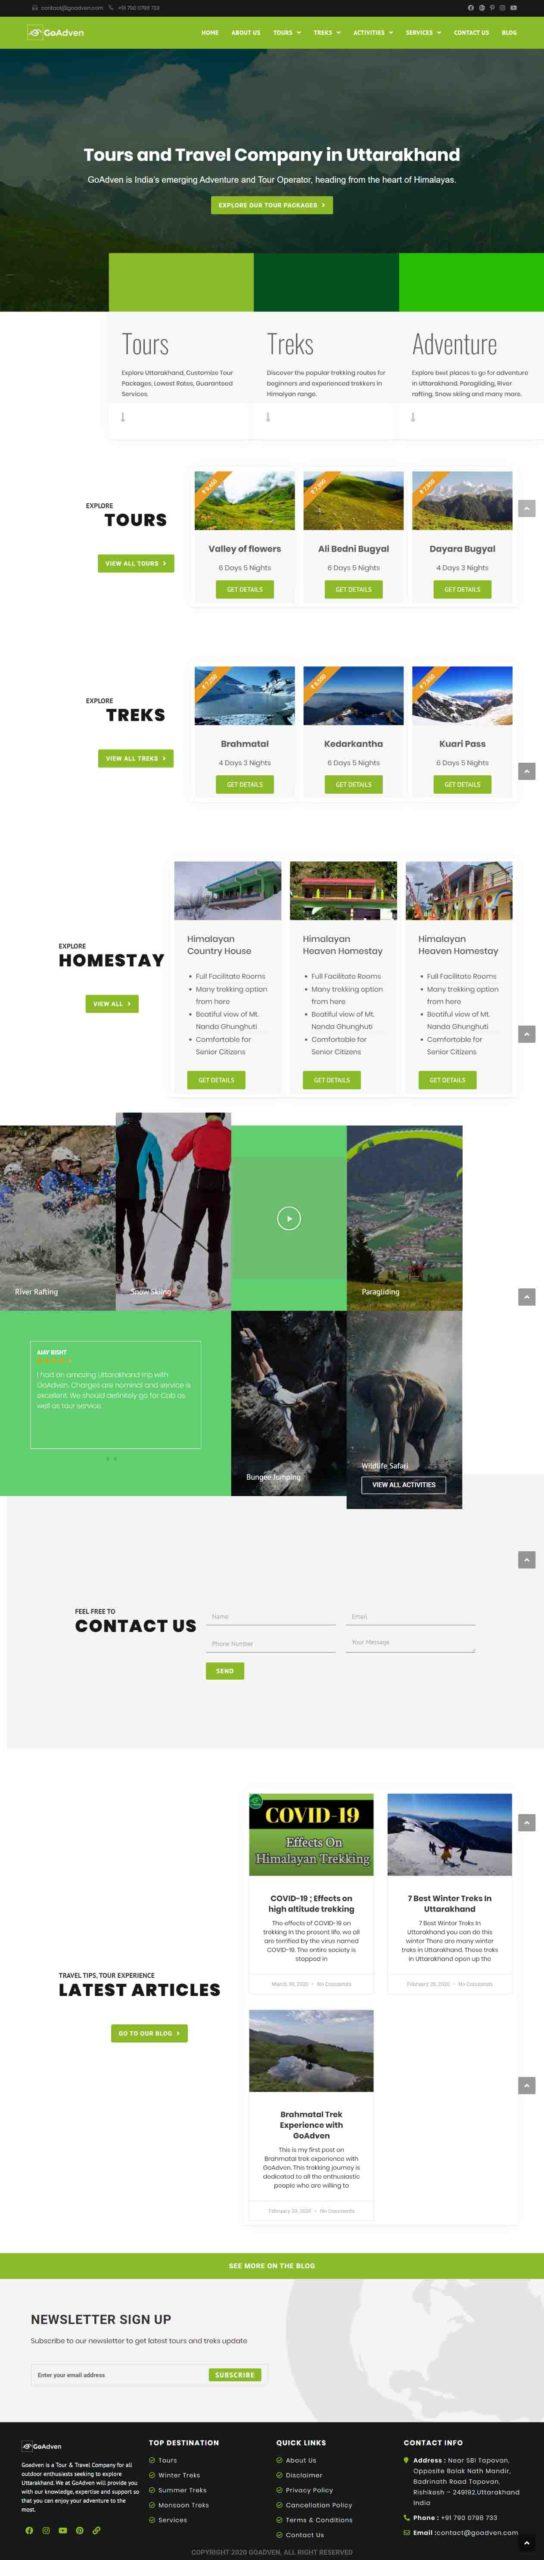 Digital Marketing Company in Uttarakhand goadven